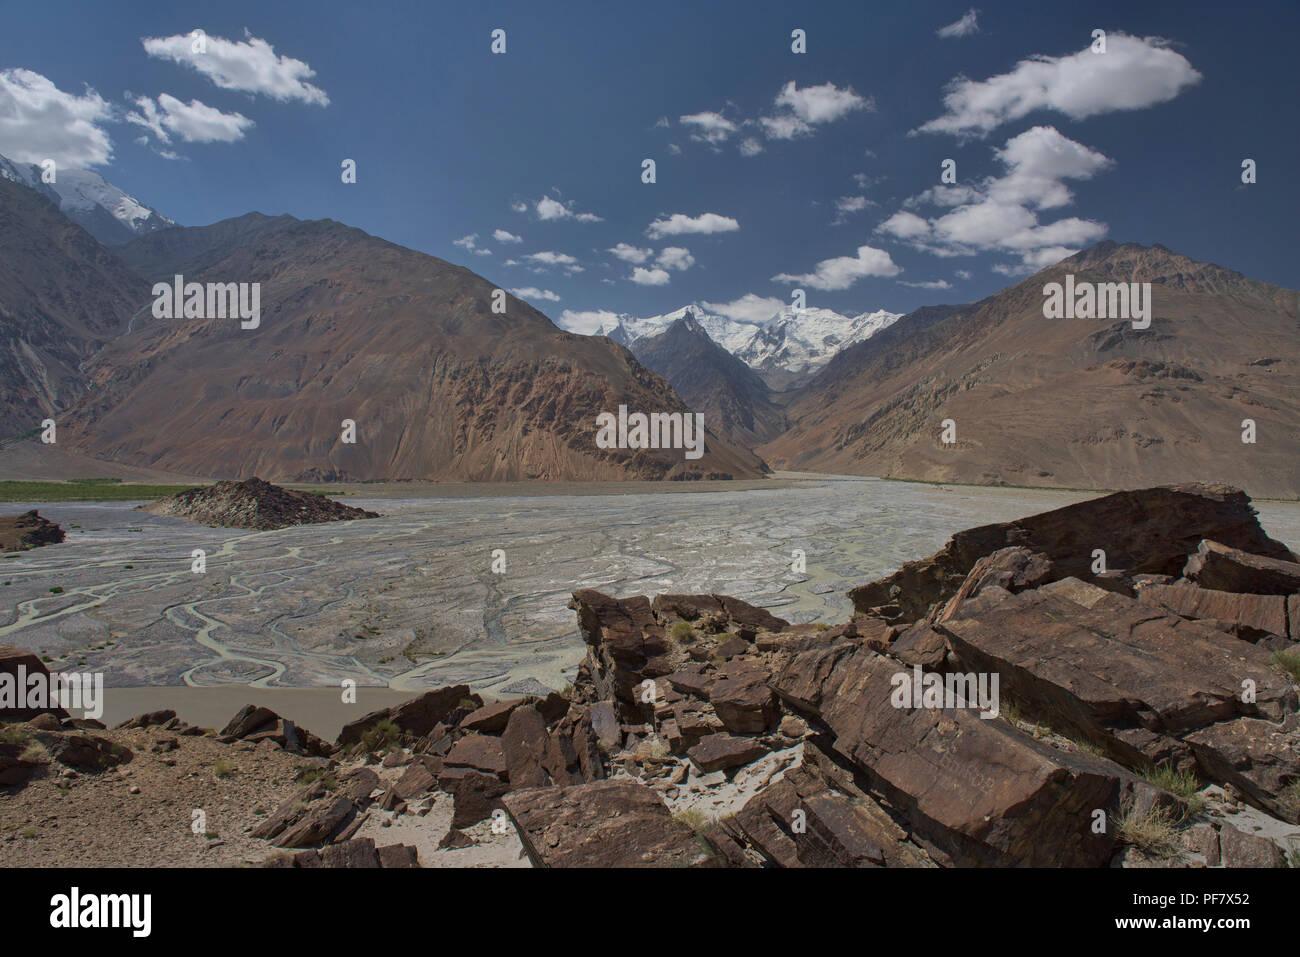 The Wakhan Valley and Afghanistan Hindu Kush, Vikchut, Tajikistan - Stock Image